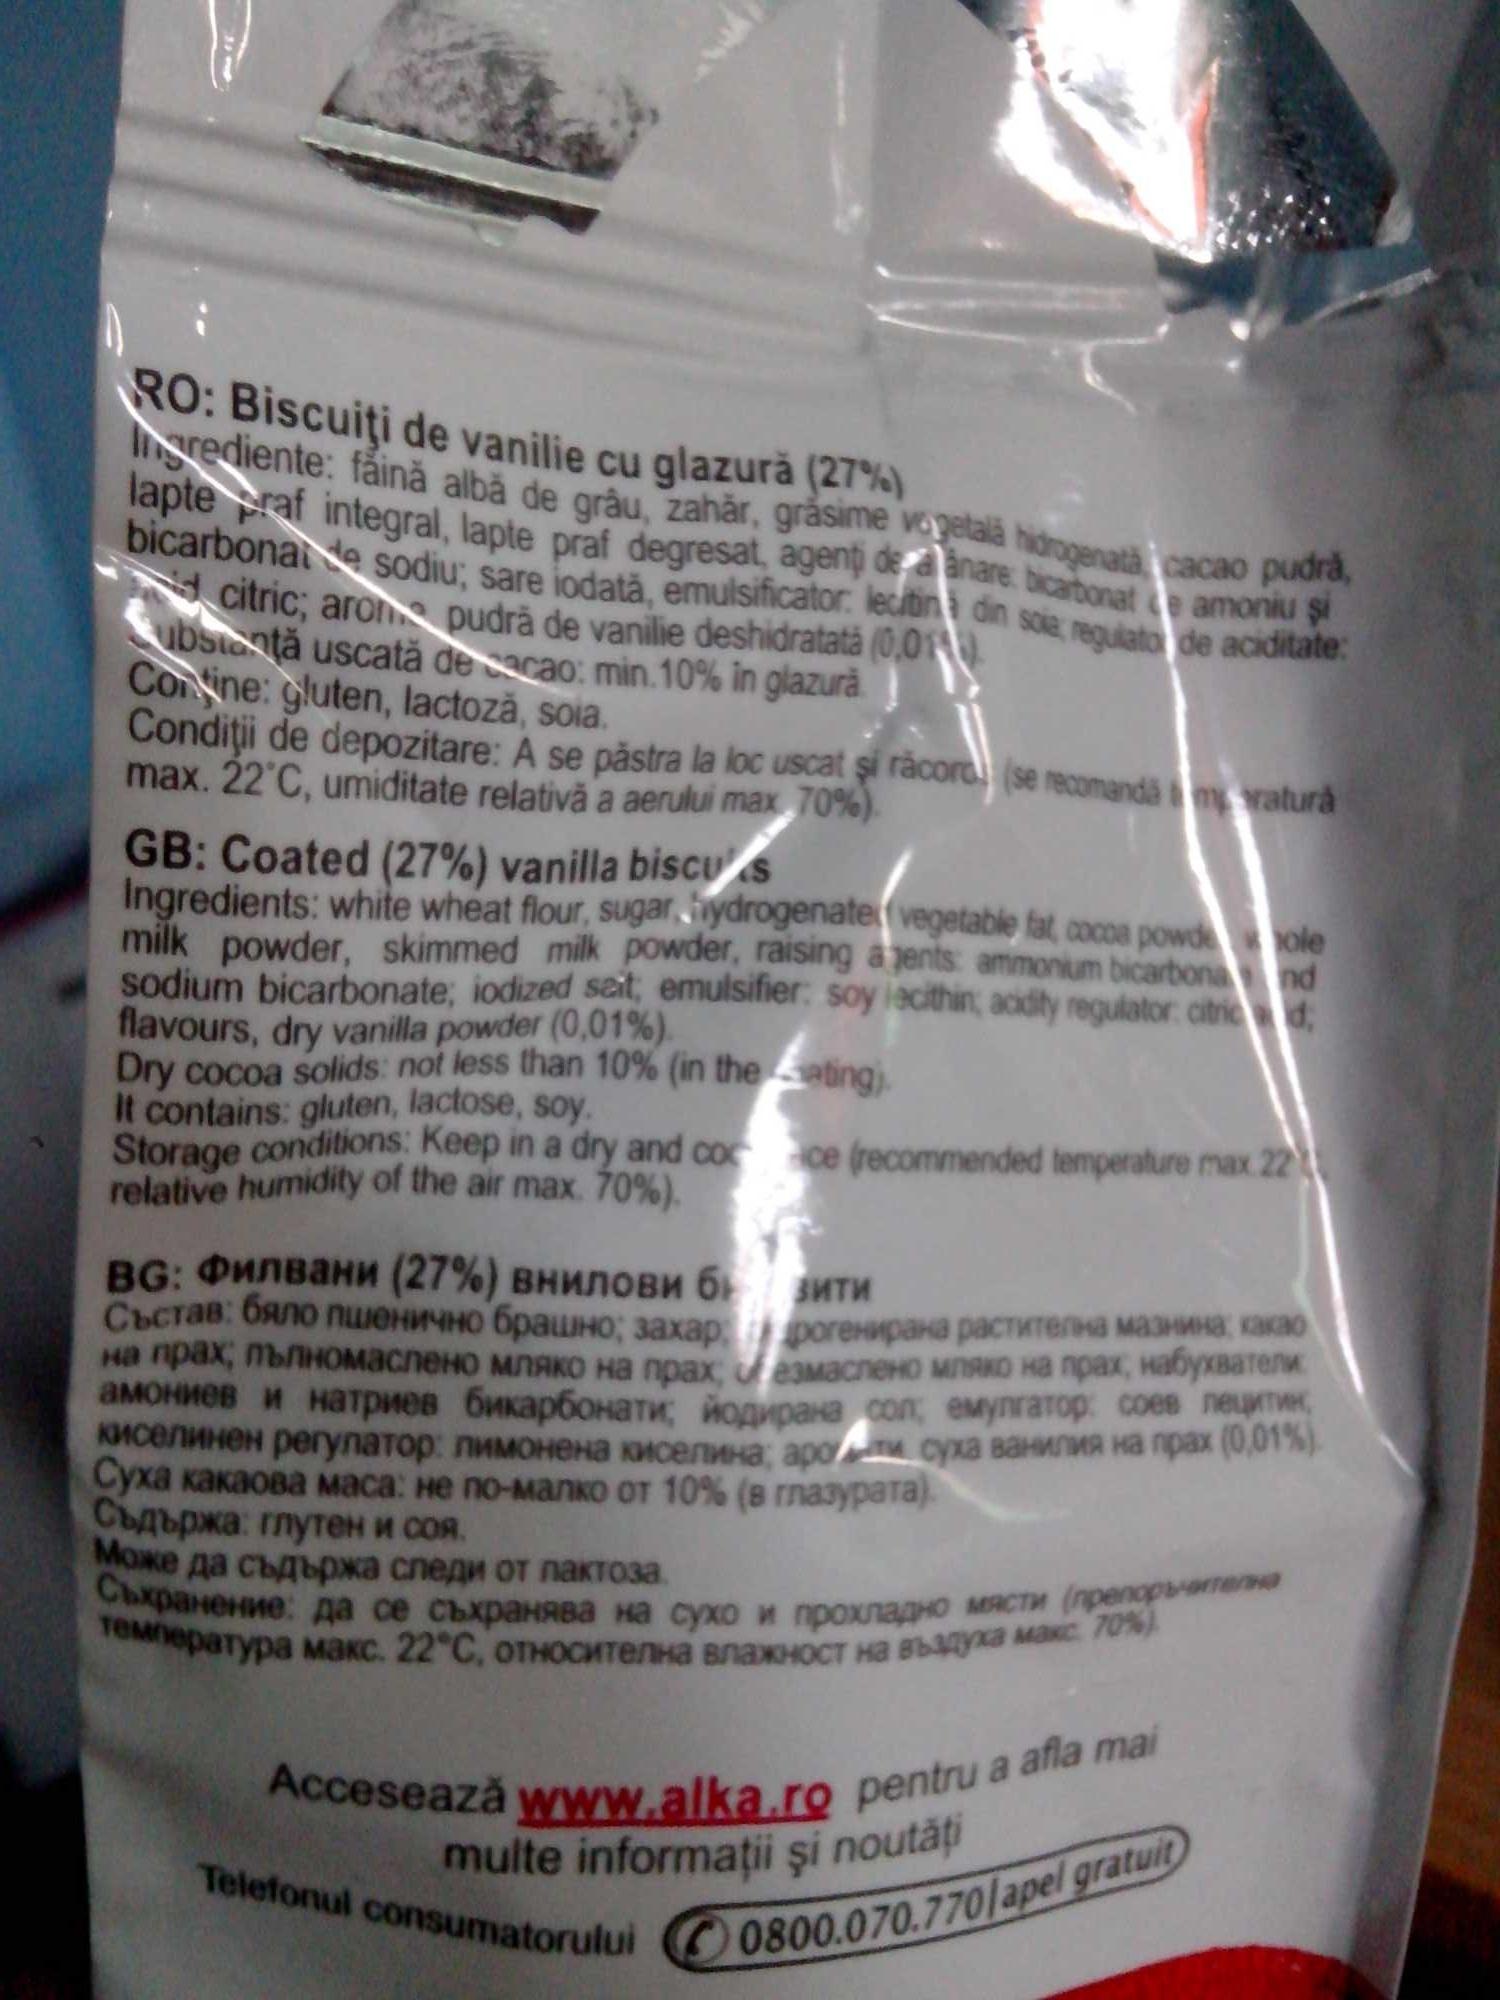 Biscuiții casei - Ingredients